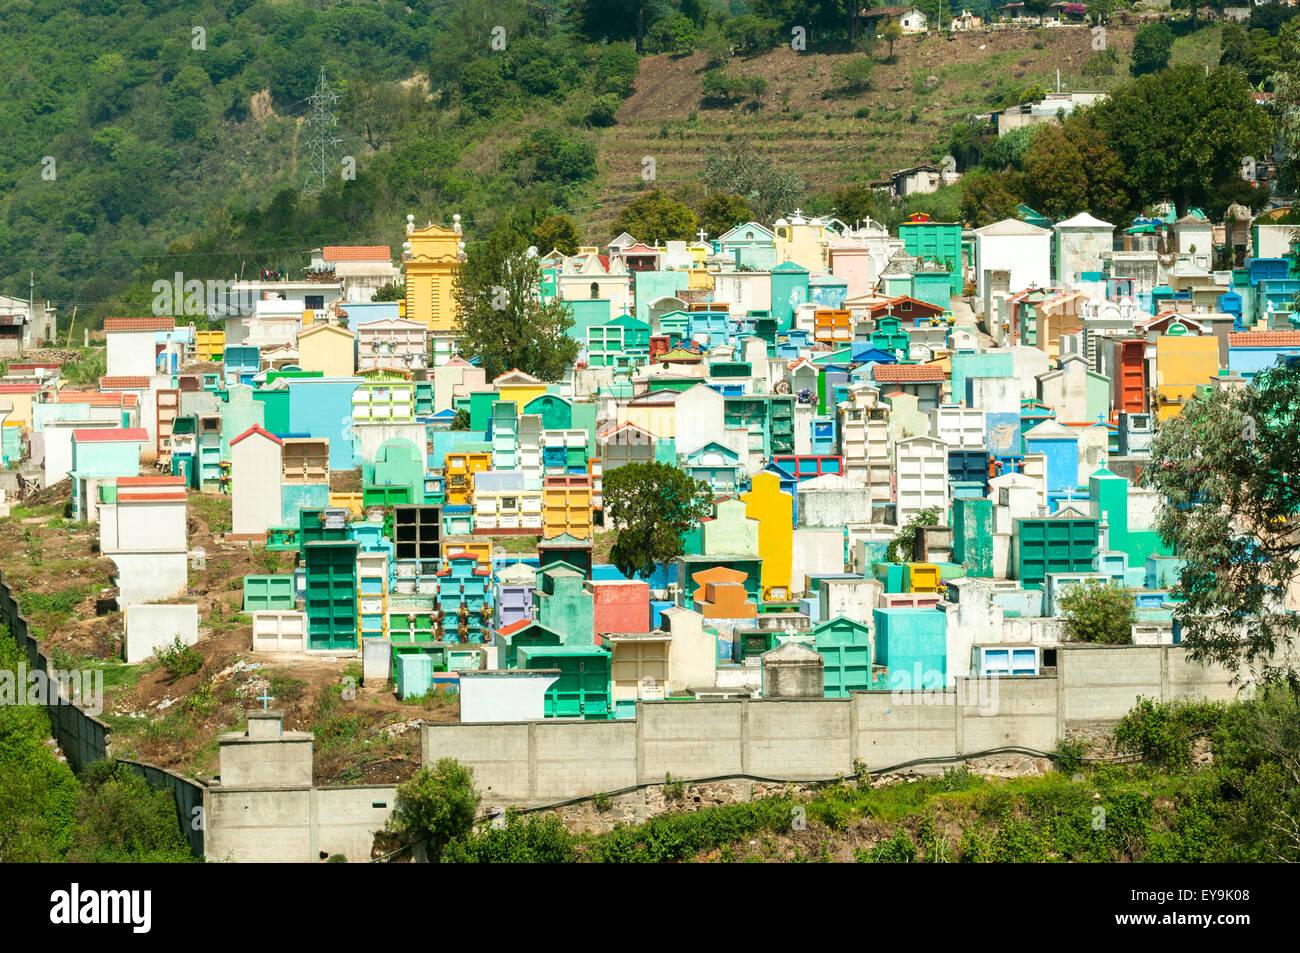 Cemetery at Solola, Guatemala - Stock Image